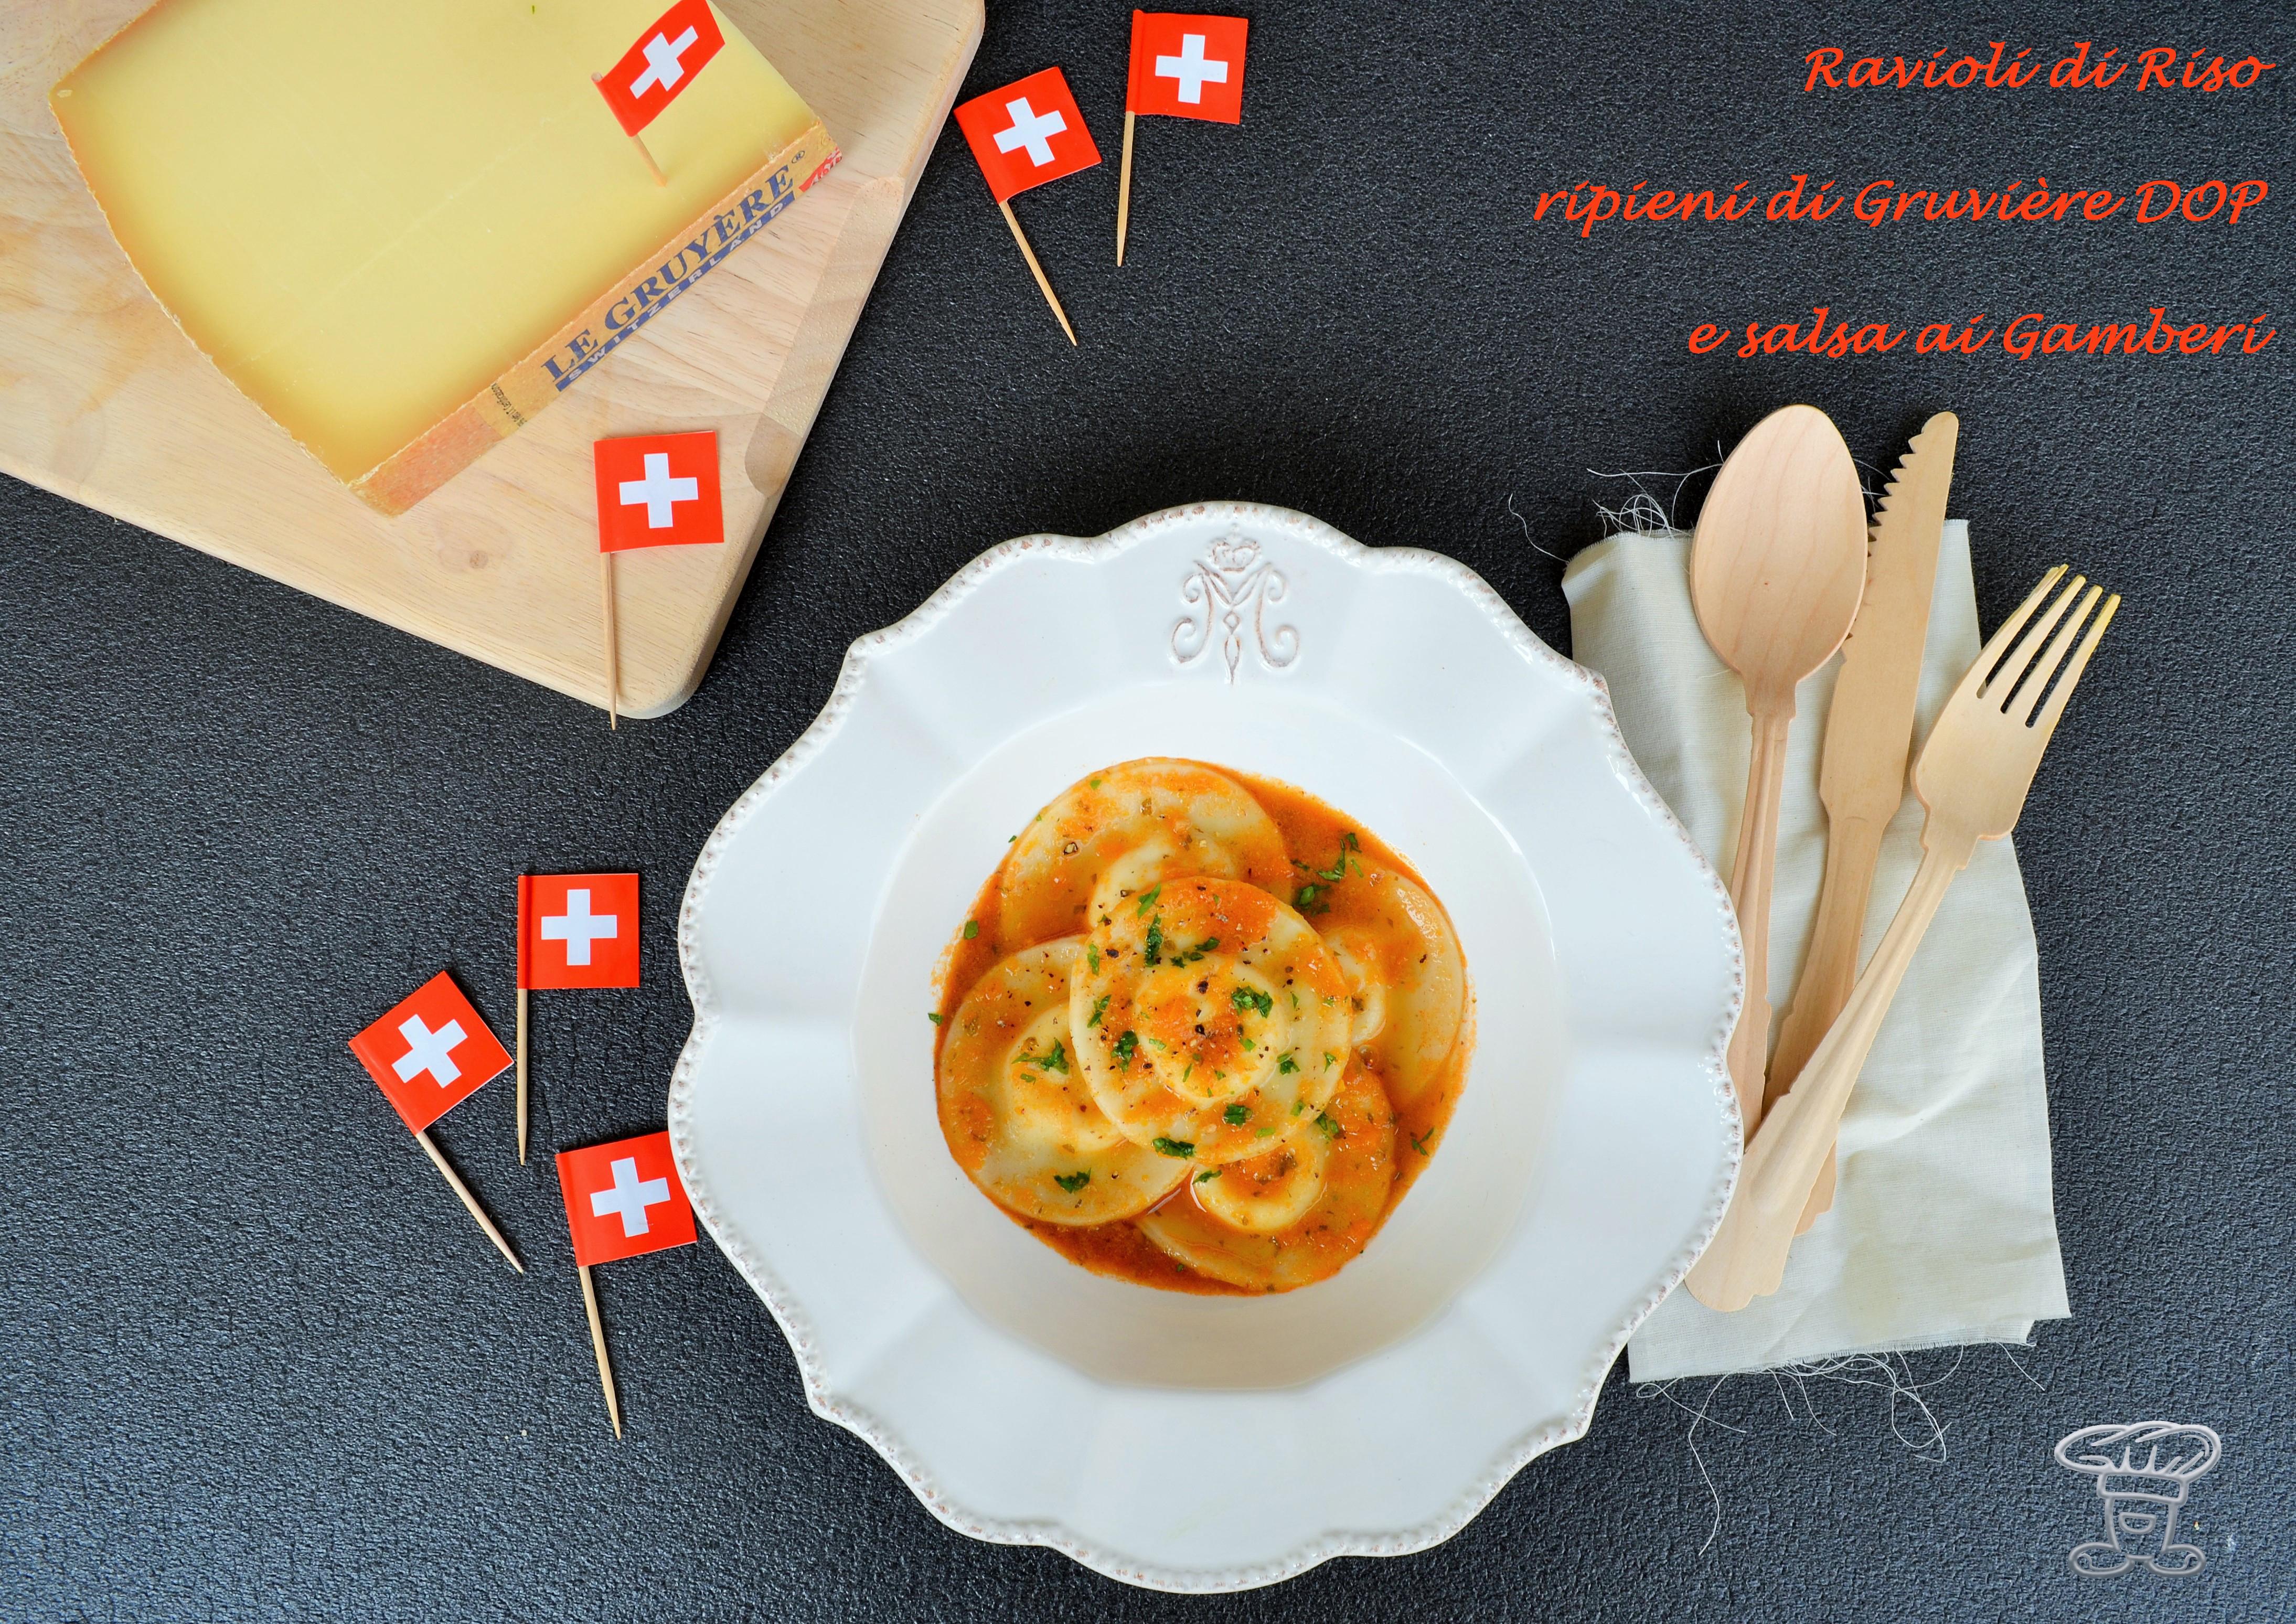 dsc_0608 Ravioli di Riso ripieni di Gruyère DOP e salsa ai Gamberi